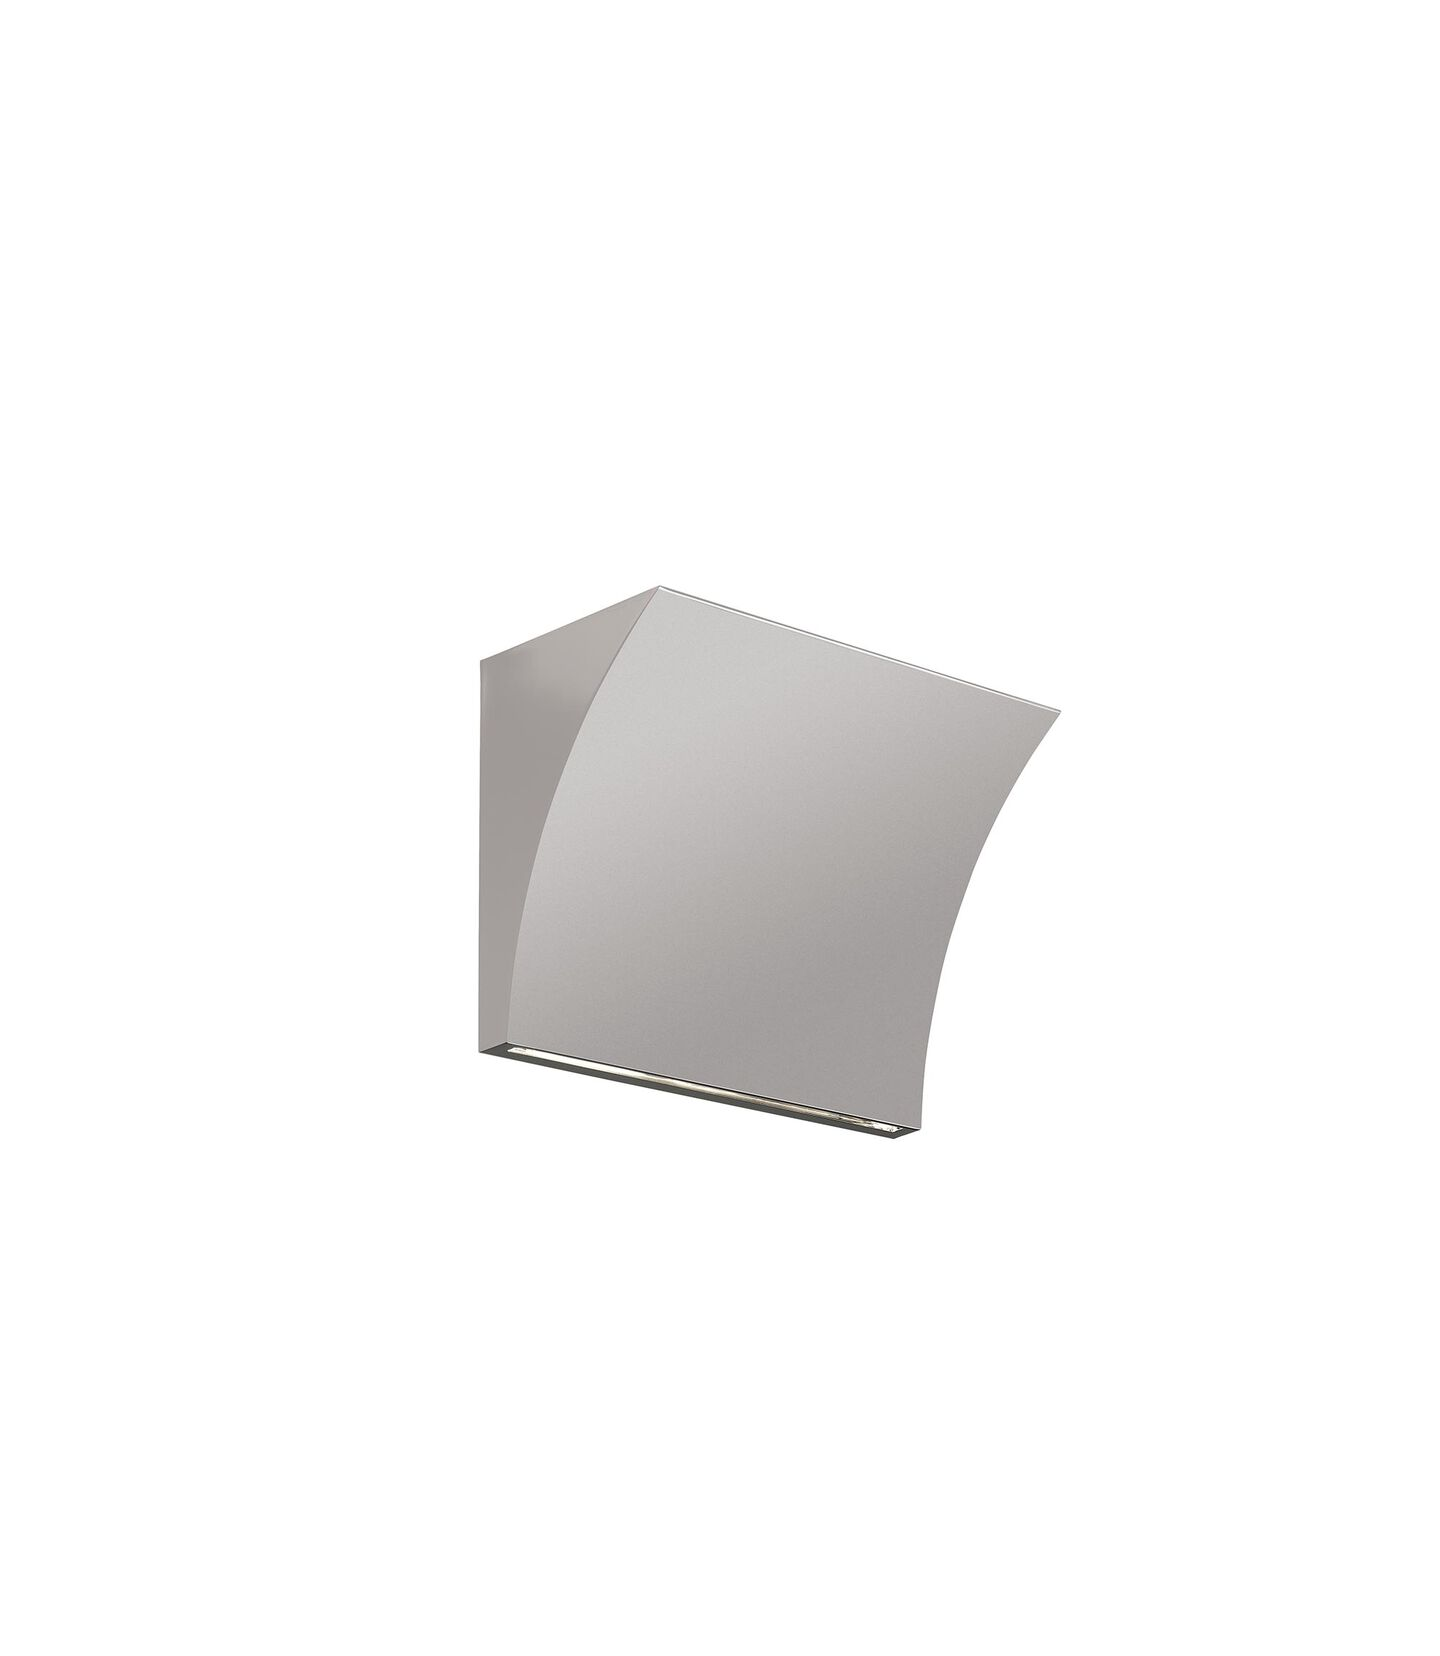 pochette-up-down-wall-led-dordoni-flos-F9705020-product-still-life-big